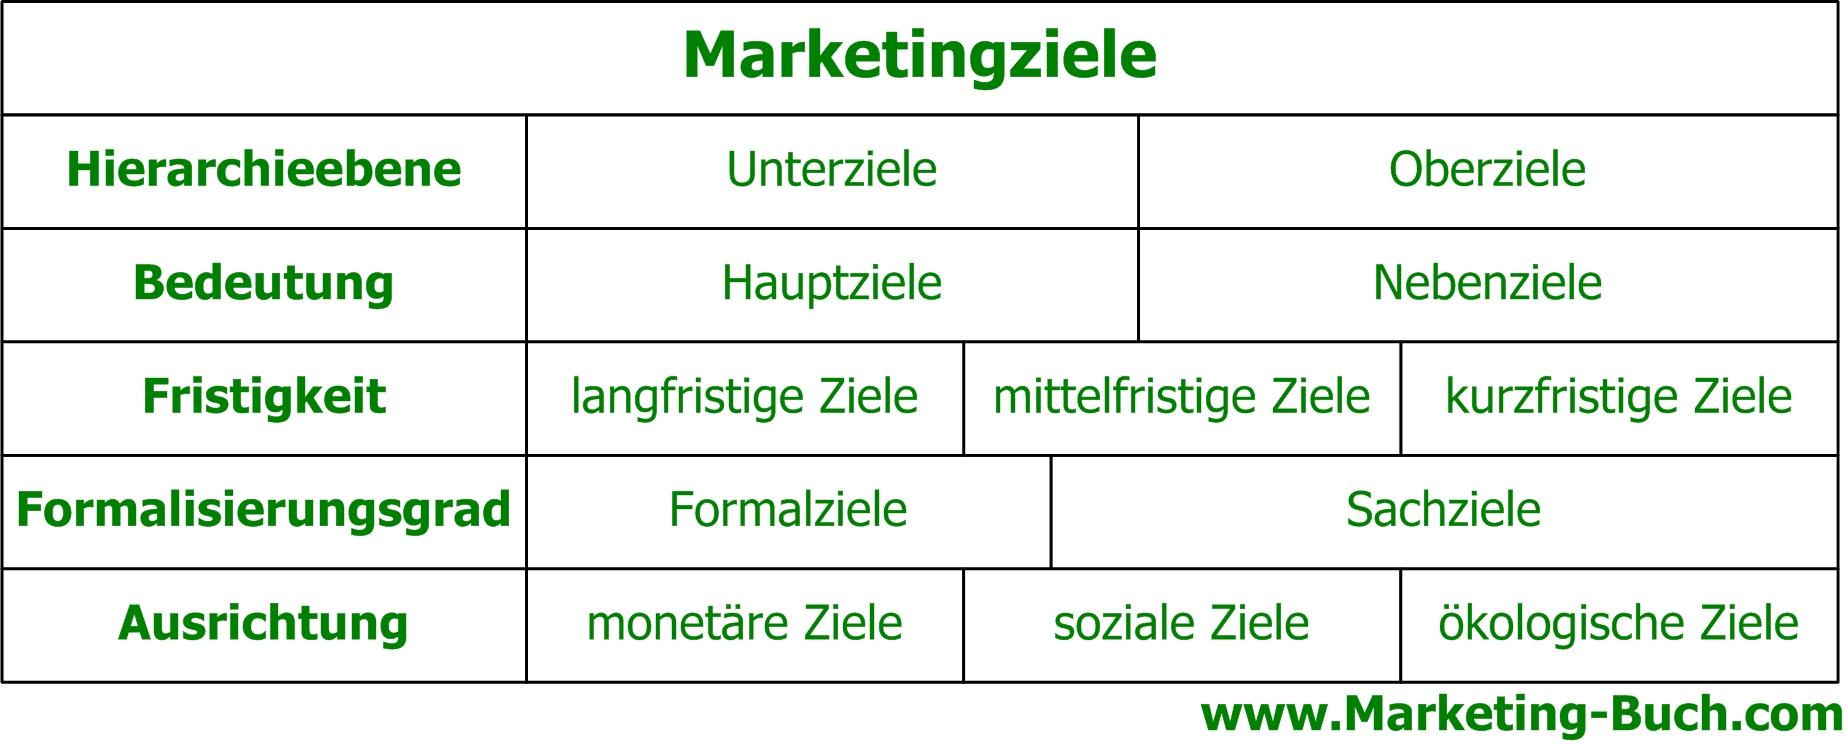 Marketingziele lll➤ #Definition #Beispiele